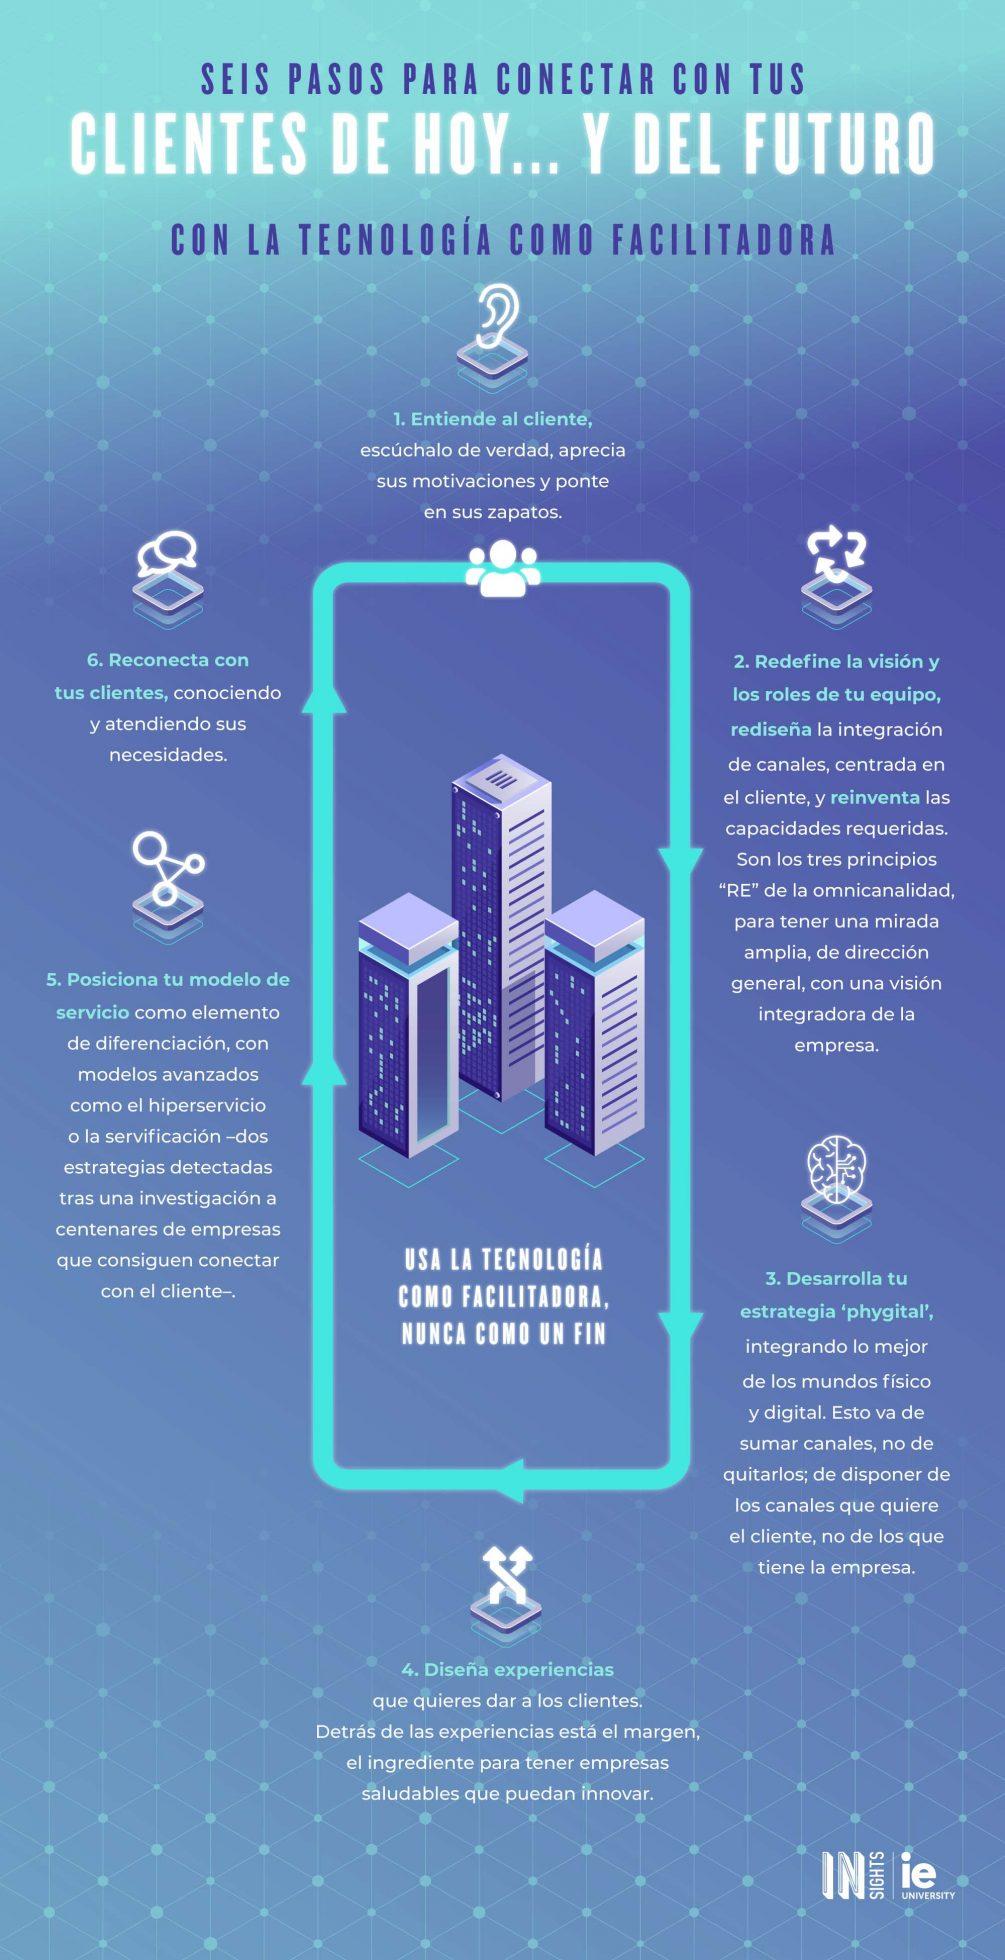 Infografia - Metodo Winners esp